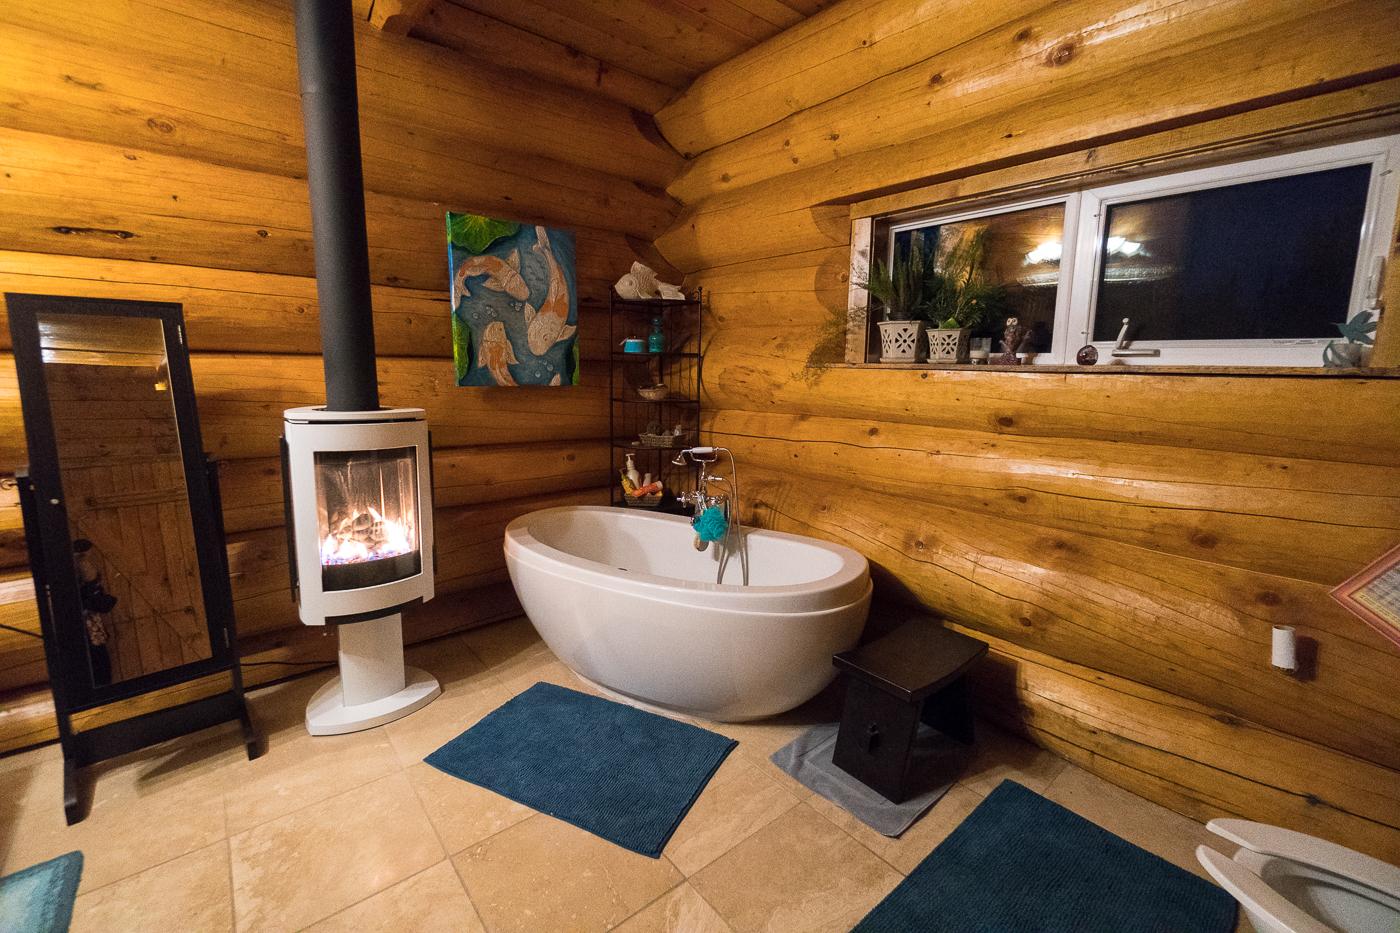 Salle de bains du Gray Ridge Lodge du Yukon